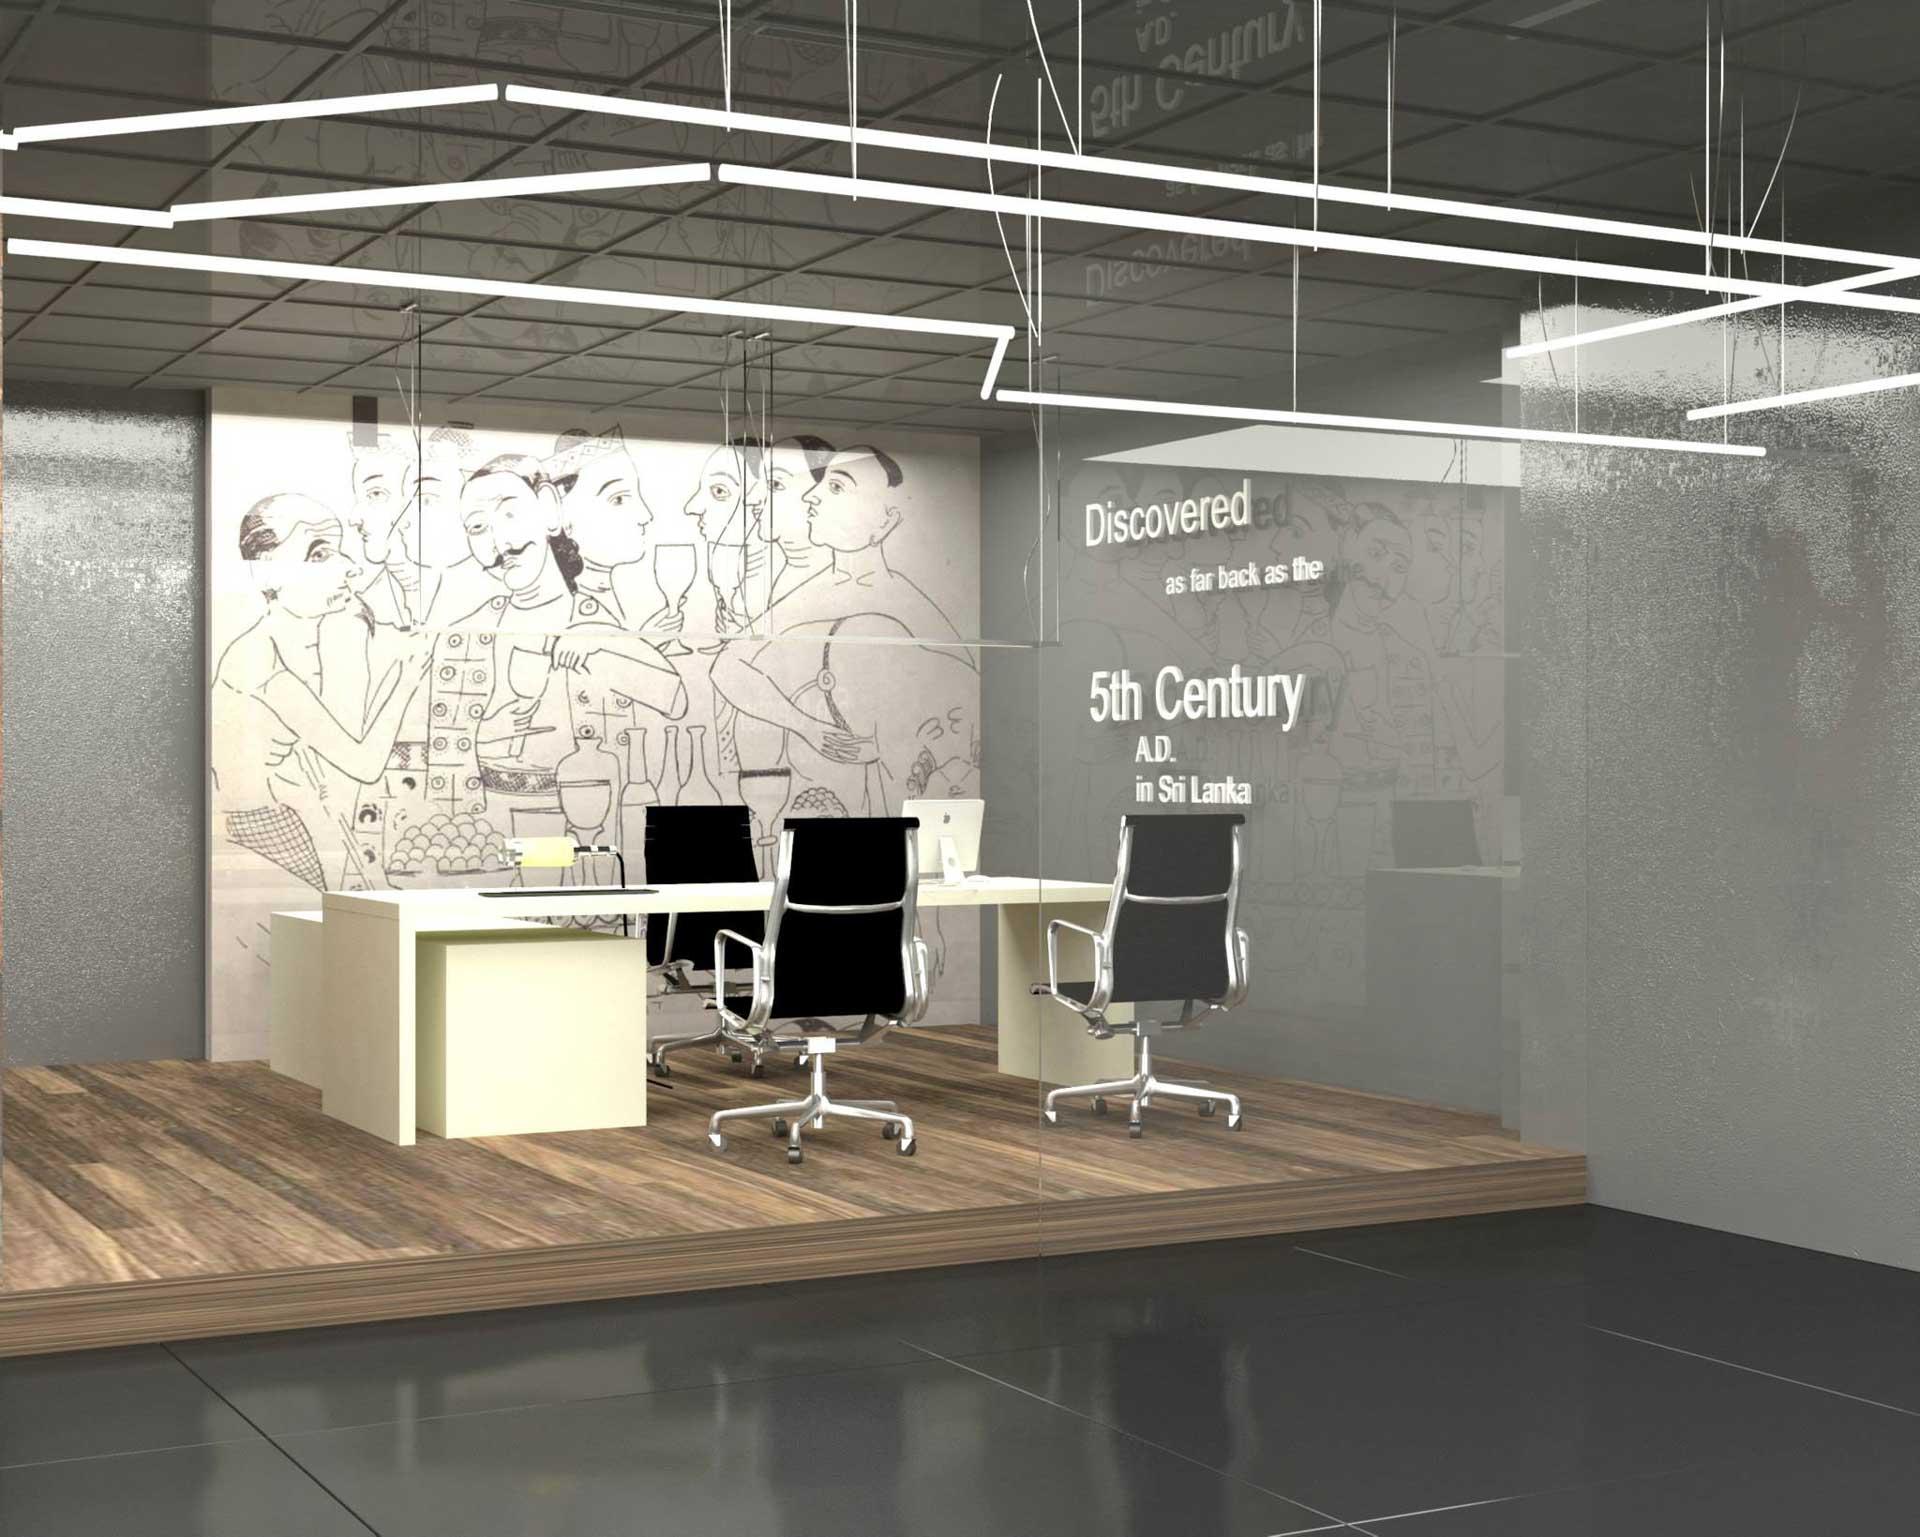 DCSL Arrack Image 02 | Office Space Interior Design in Sri Lanka